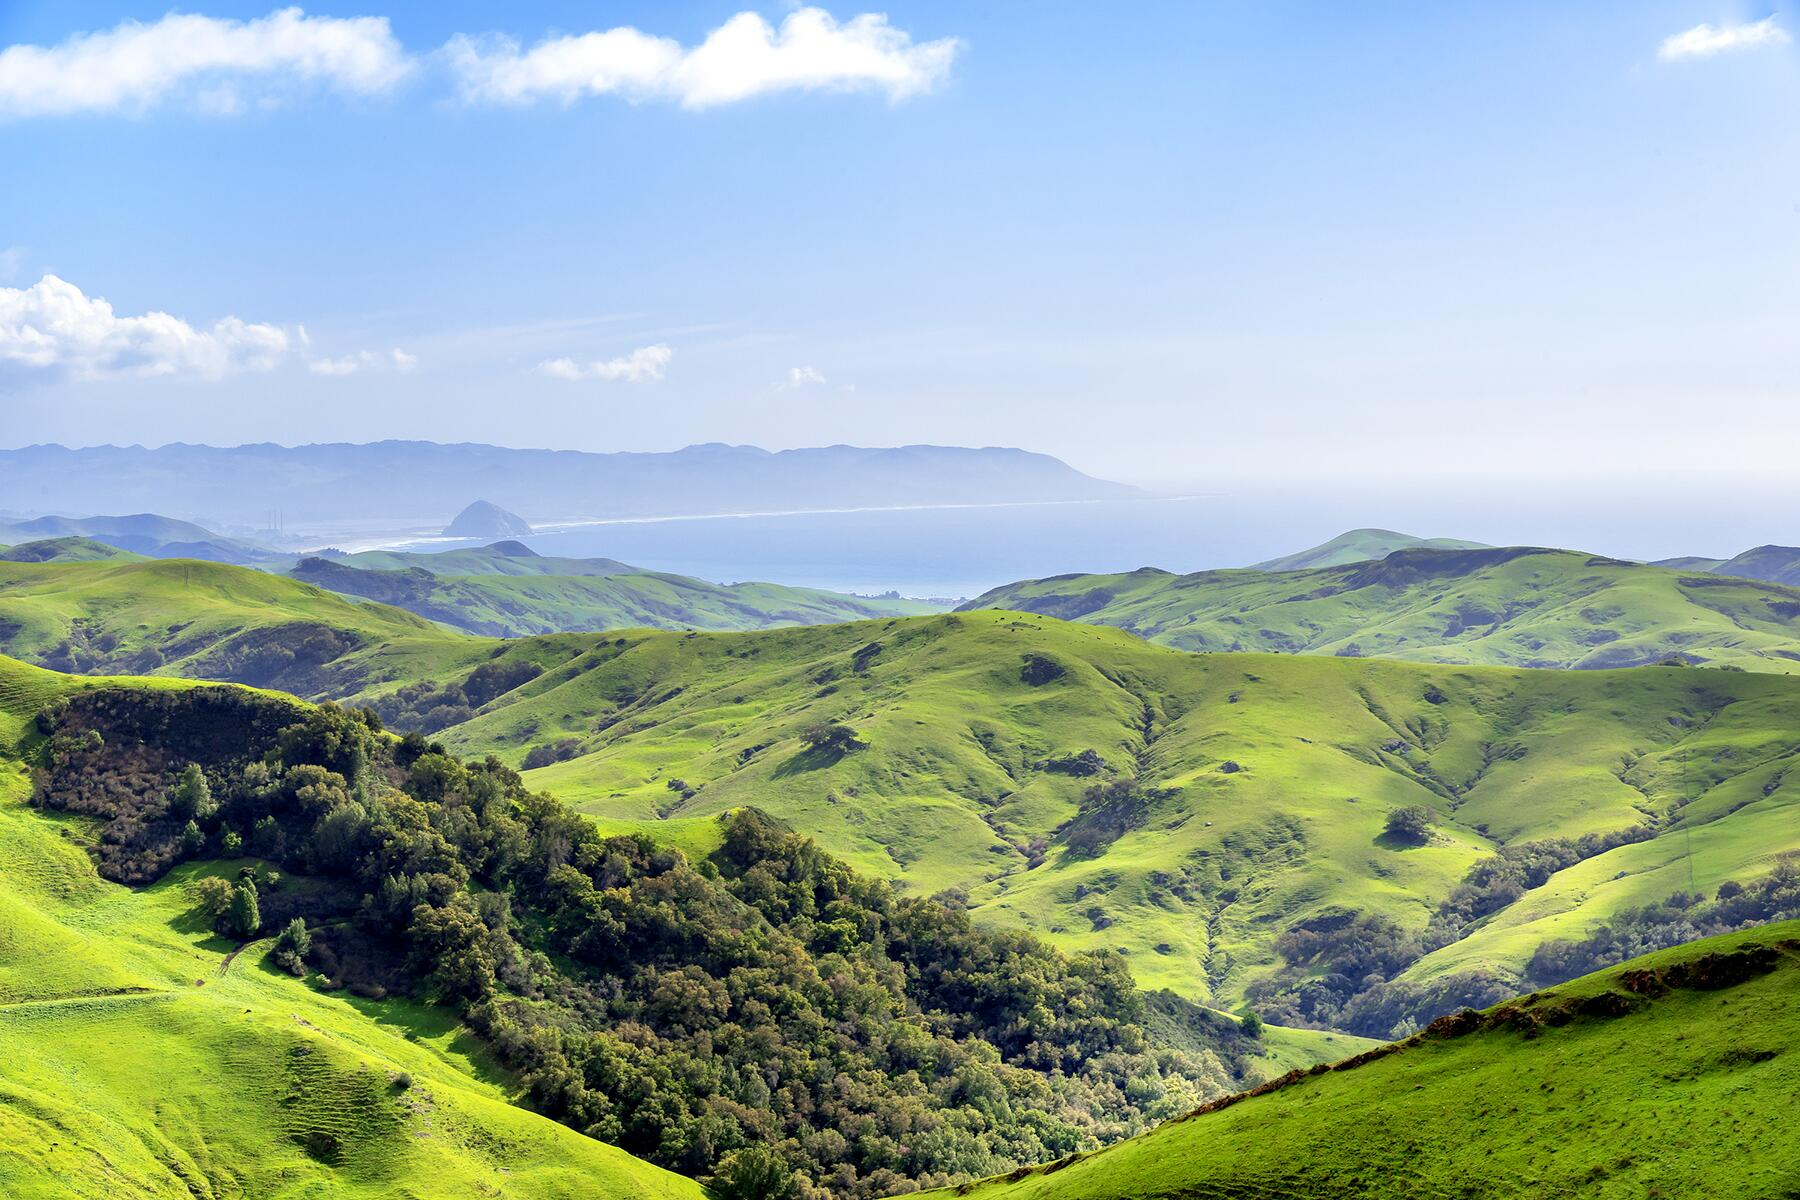 Los Angeles to San Luis Obispo, California